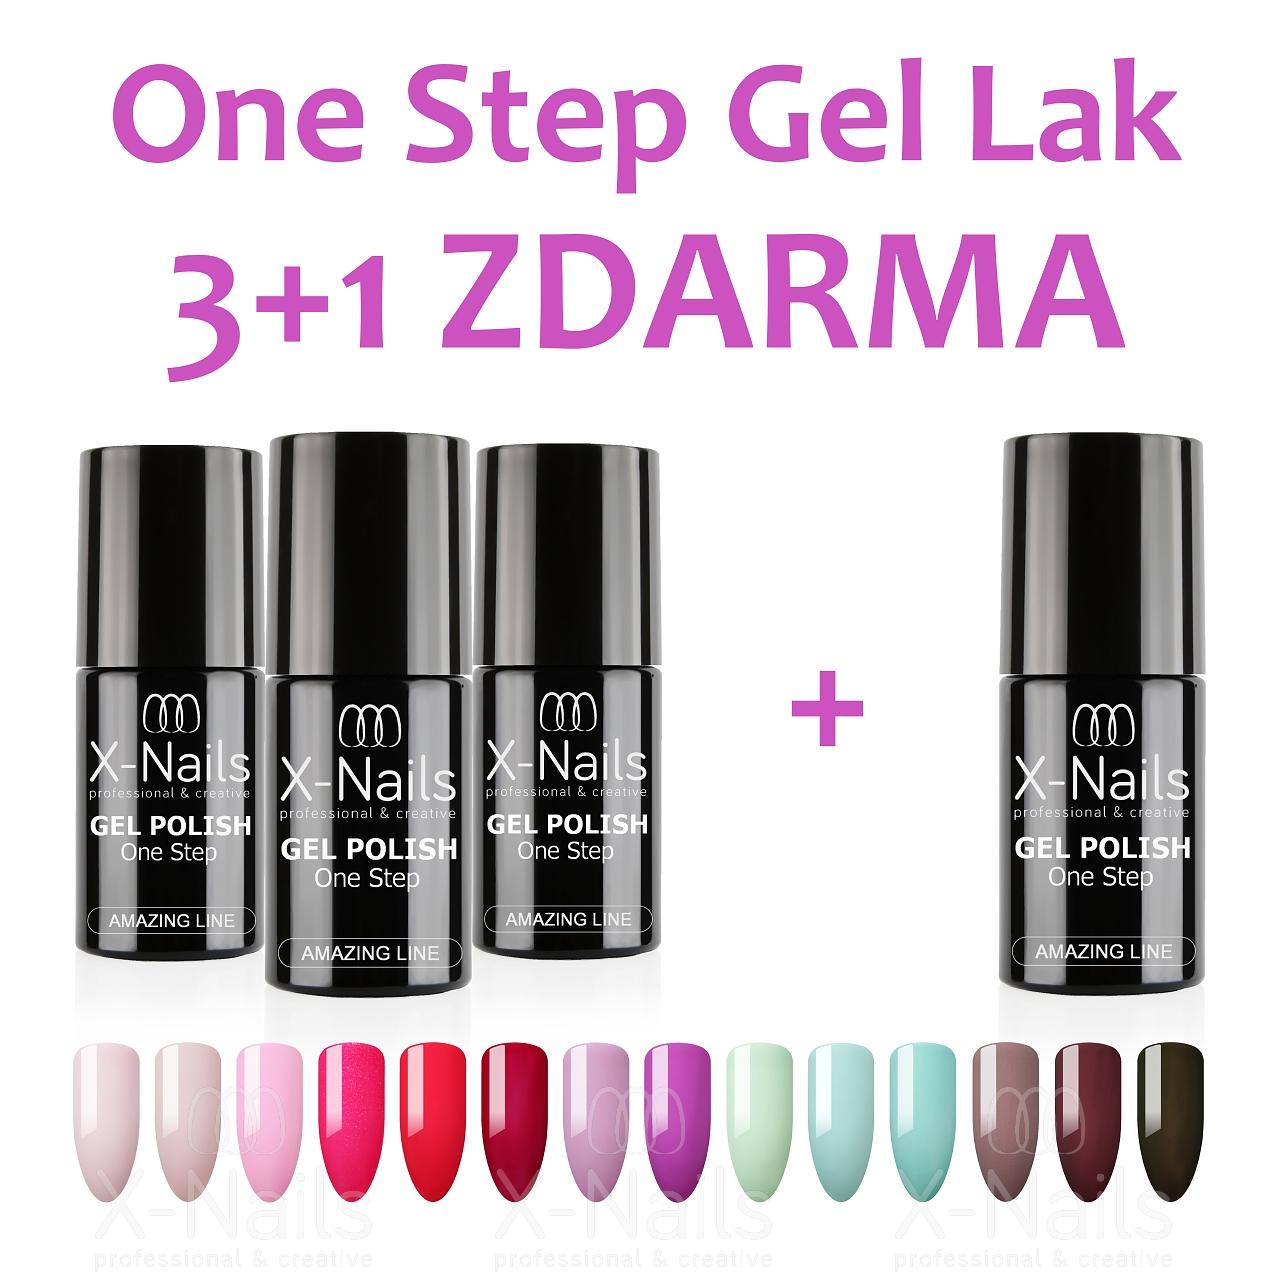 Jednofazove Gel Laky One Step Gel Laky 3 V 1 X Nails